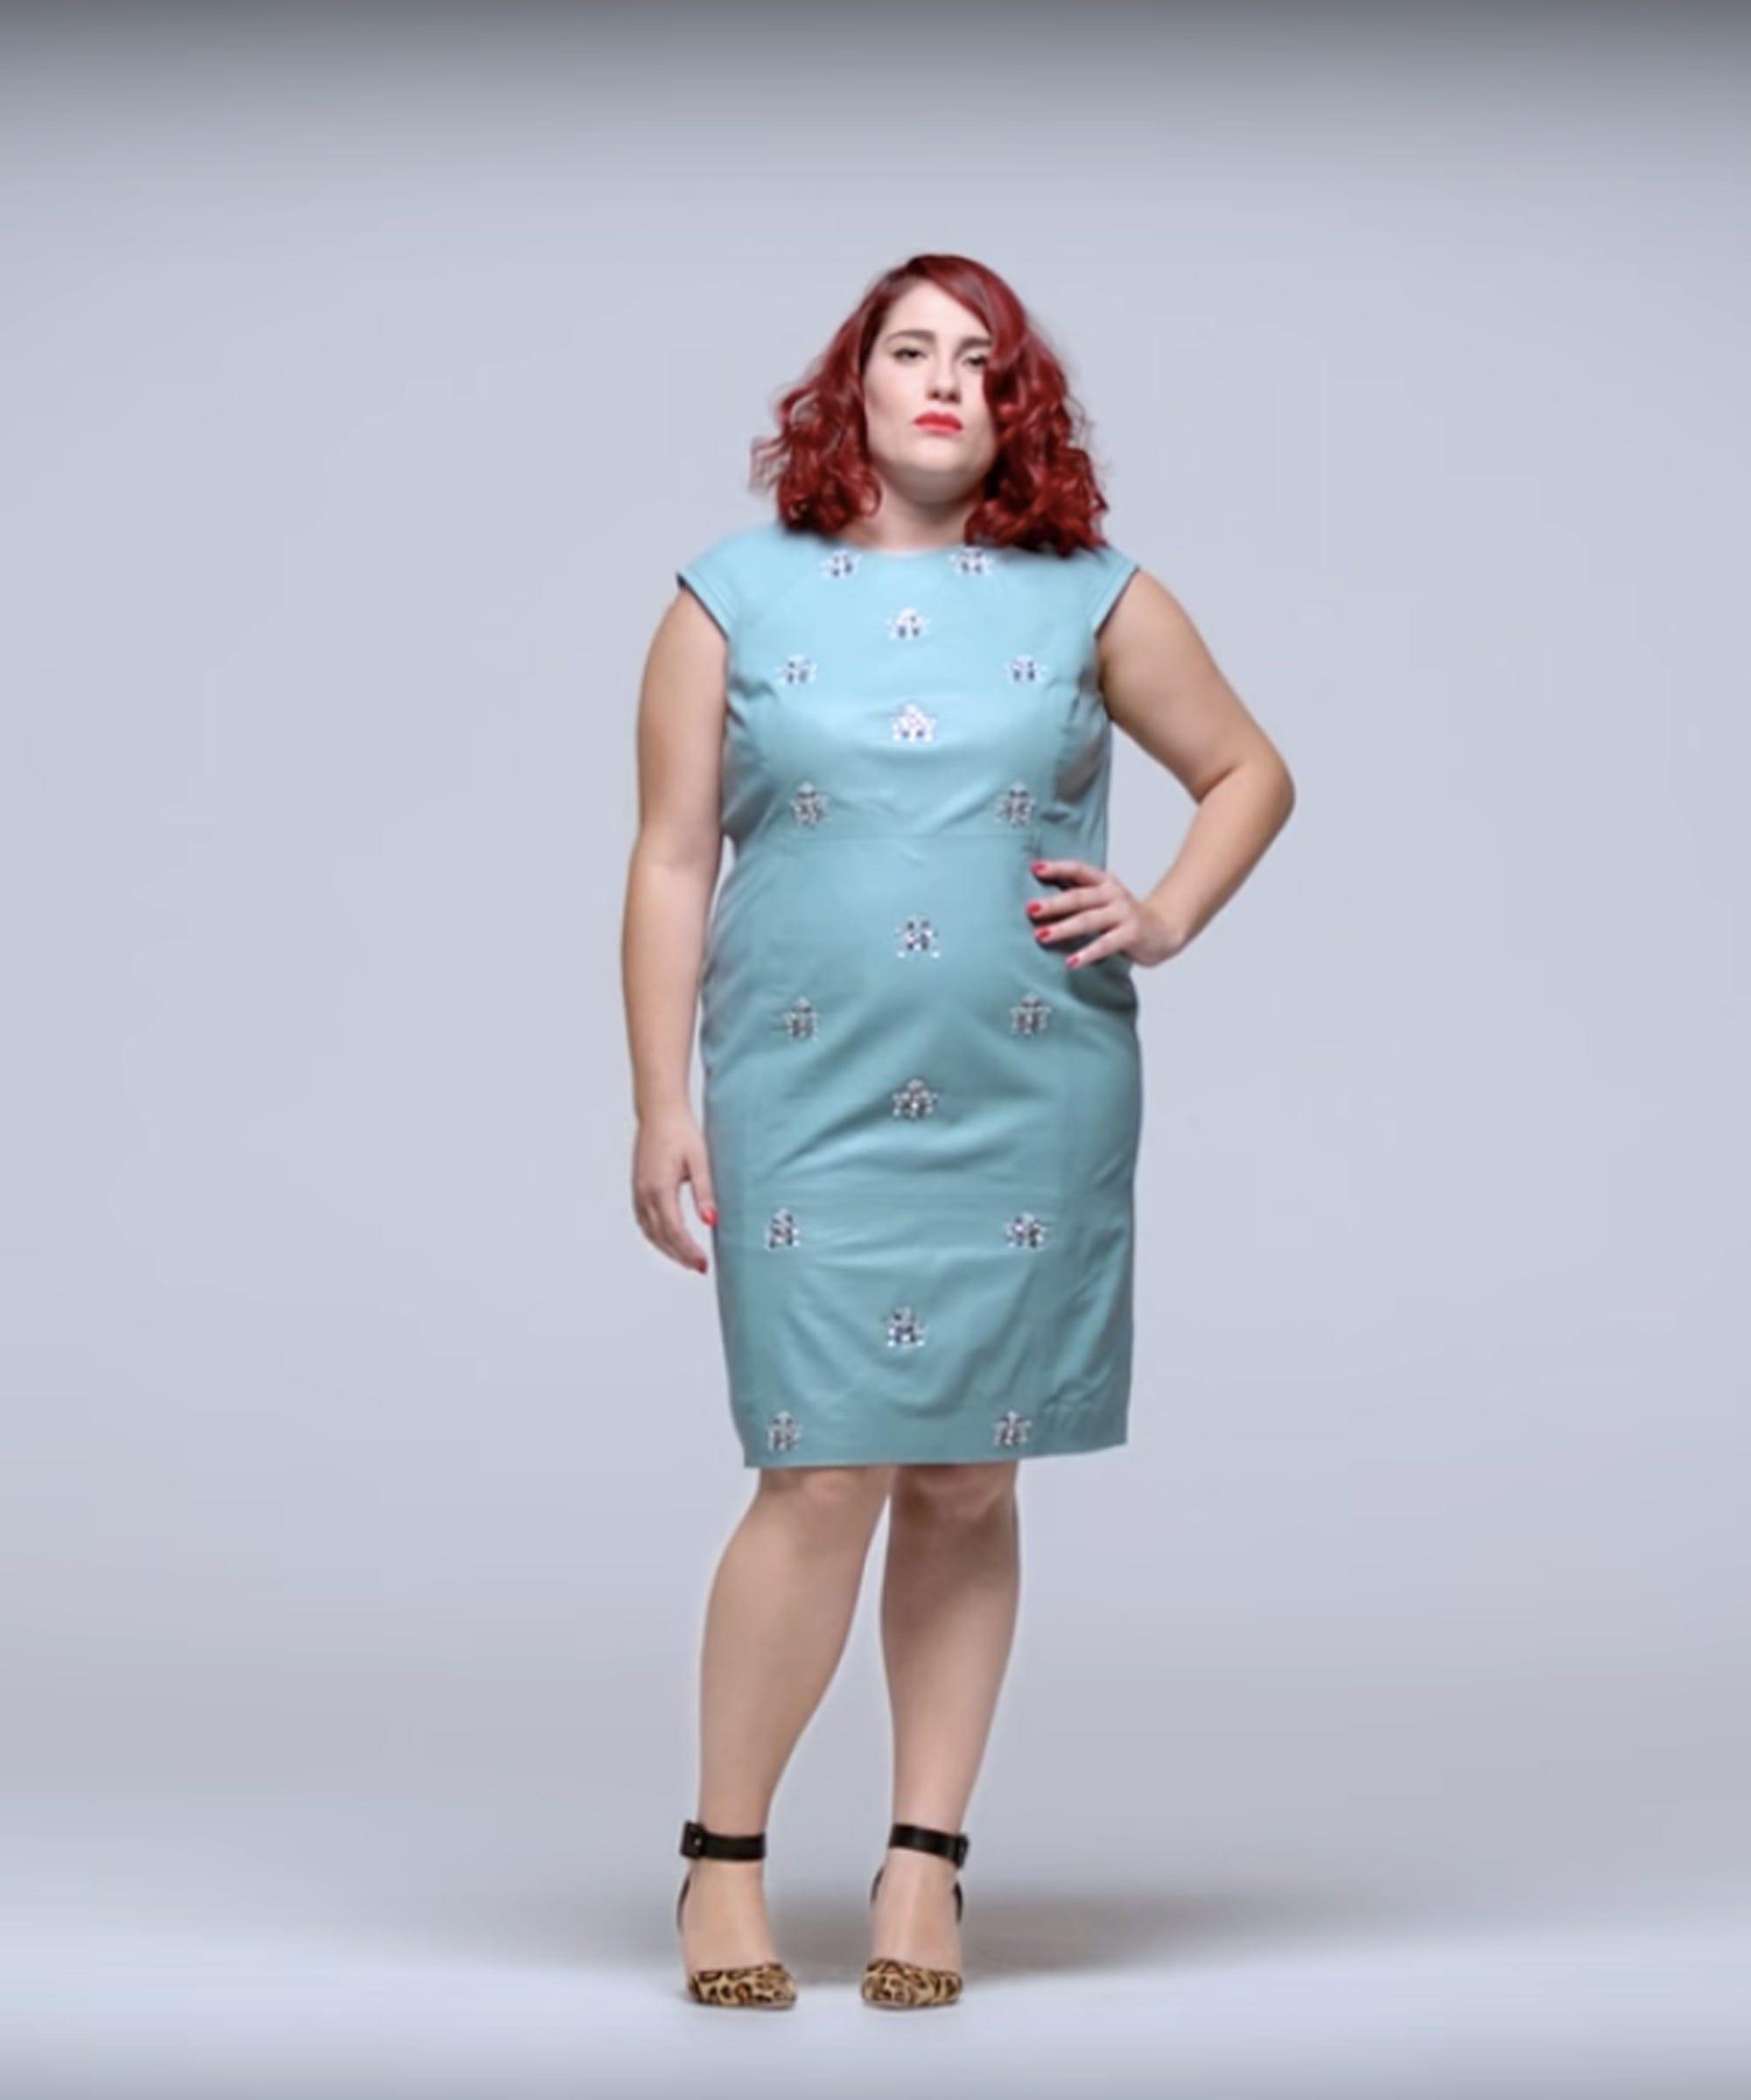 Amazon Fashion Europe Ad Campaign - I Wish I Could Wear